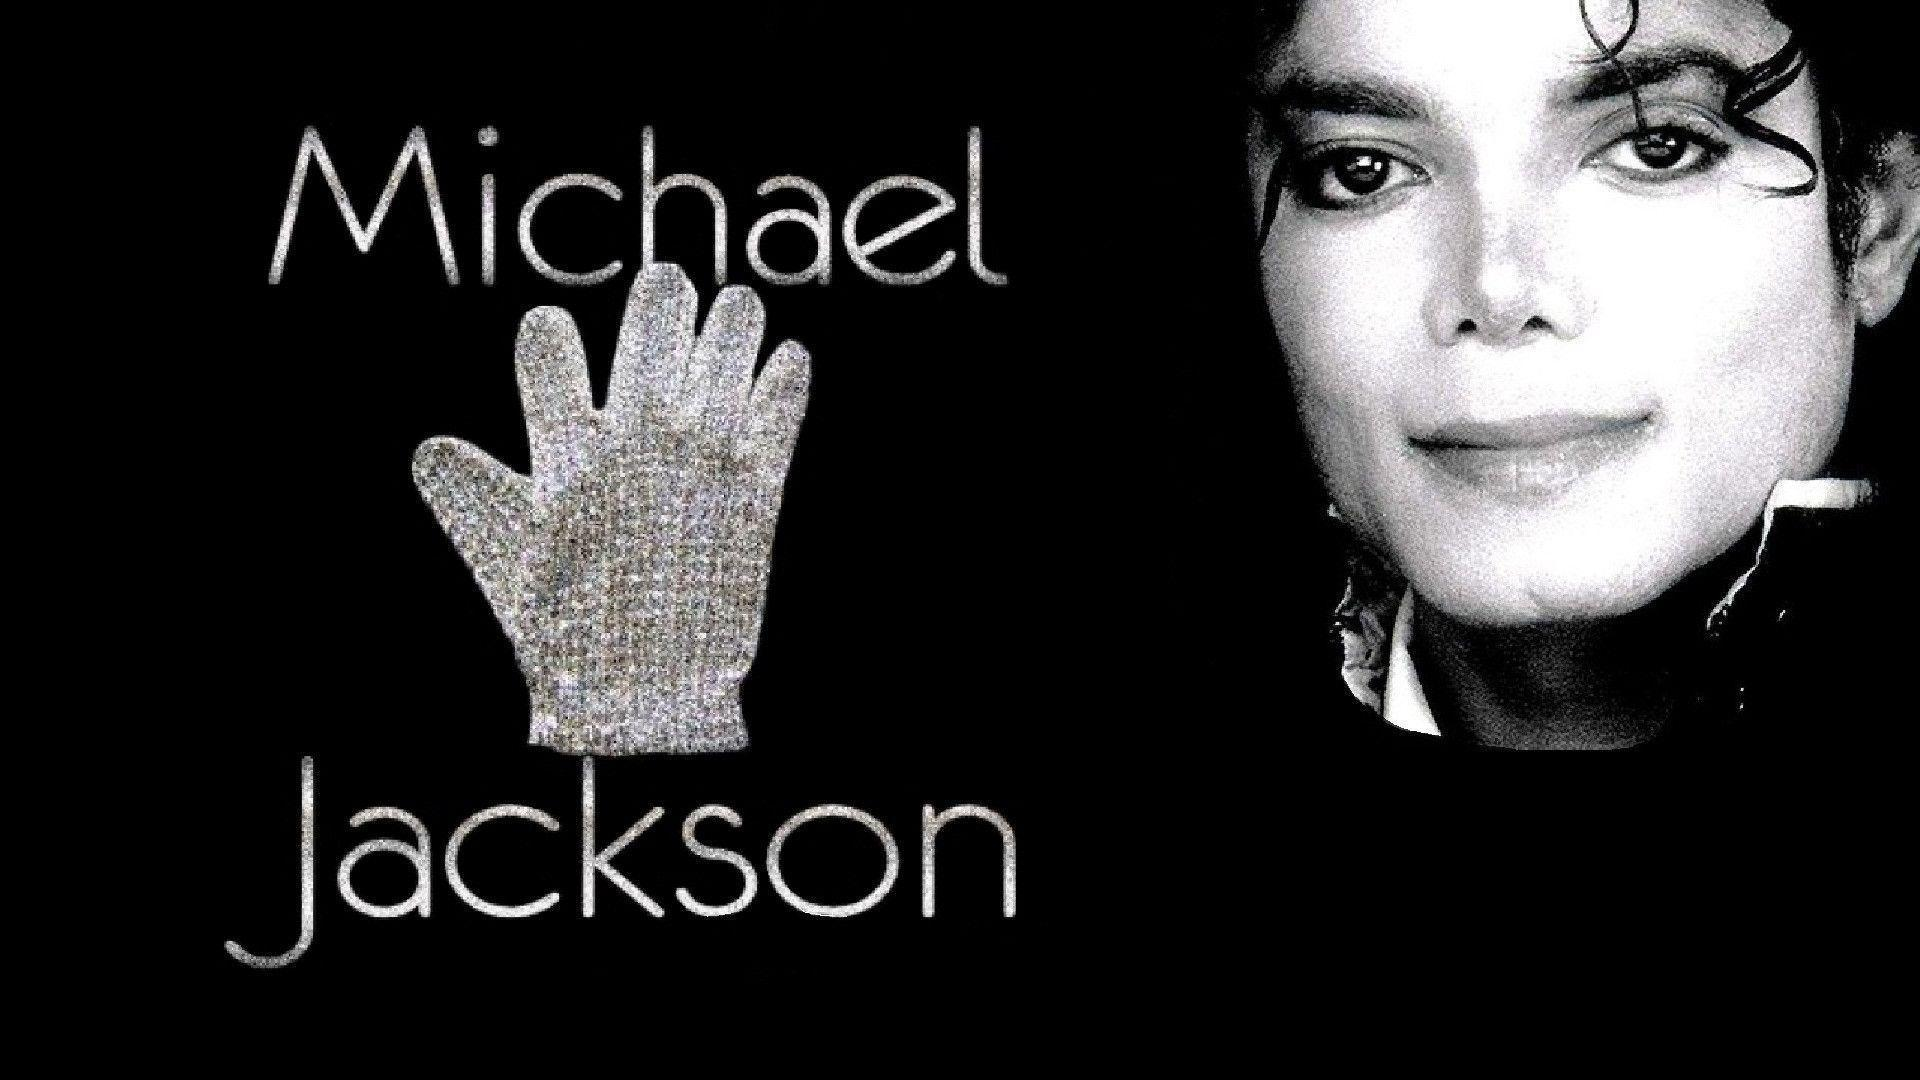 Michael Jackson Wallpapers - Wallpaper Cave